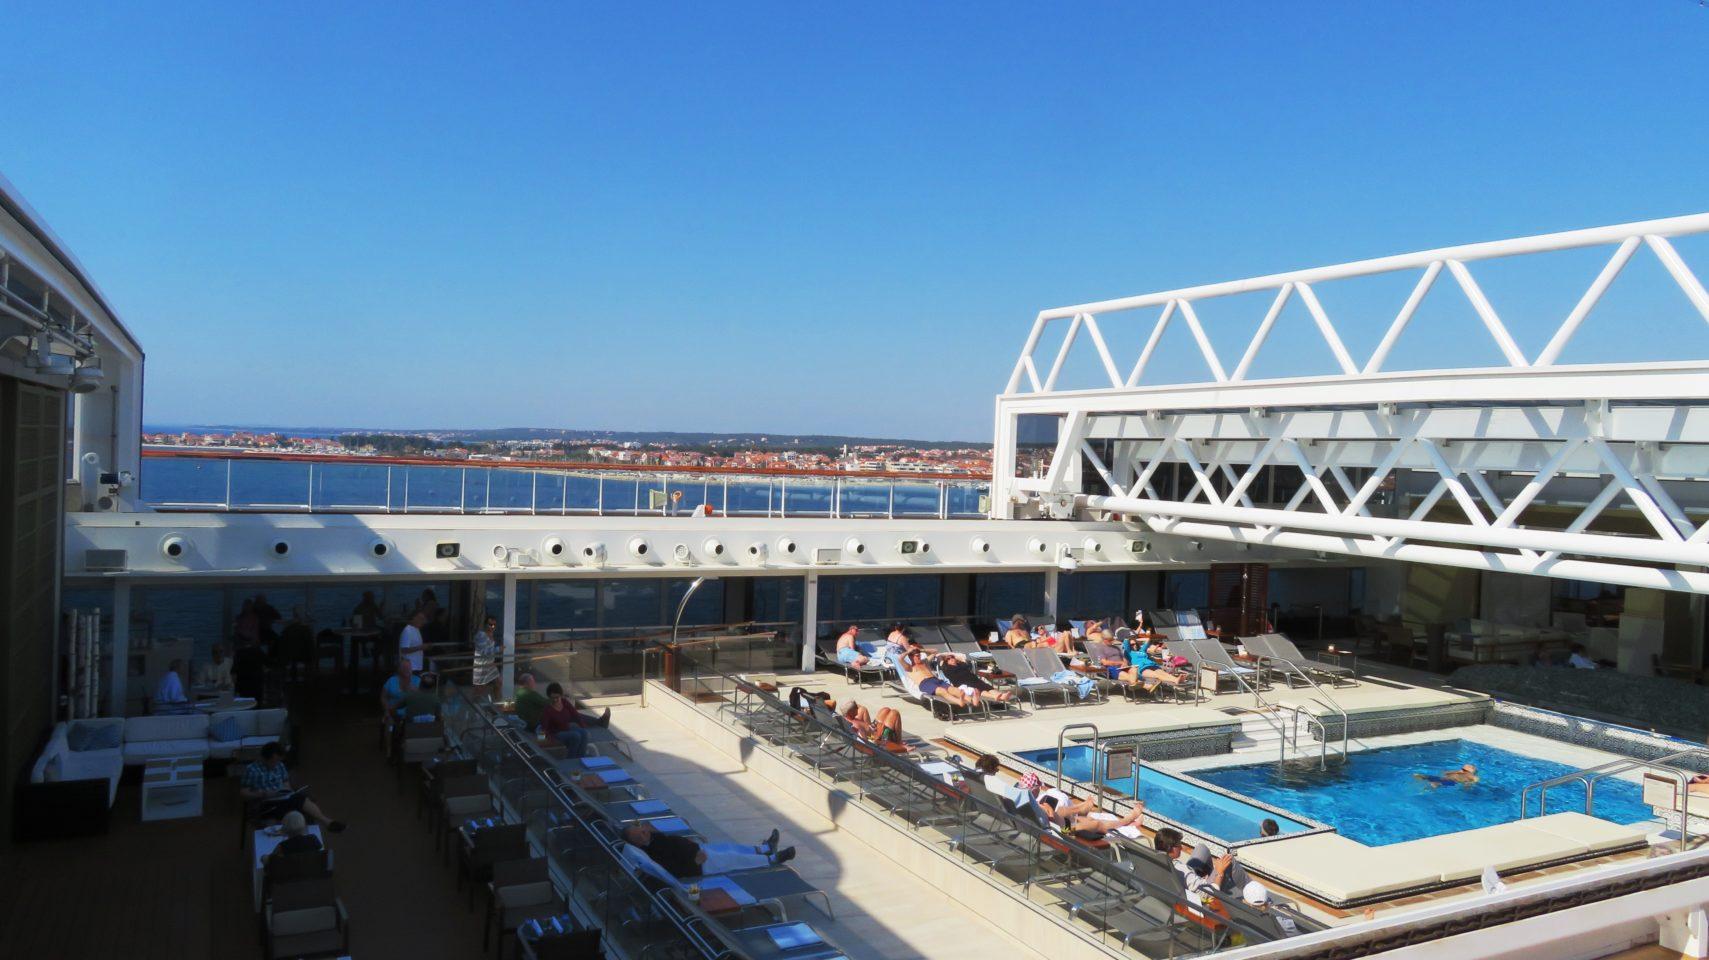 <em><strong>Viking Ocean Cruise Ships ~</strong> </em> Main Pool area on the Viking Star